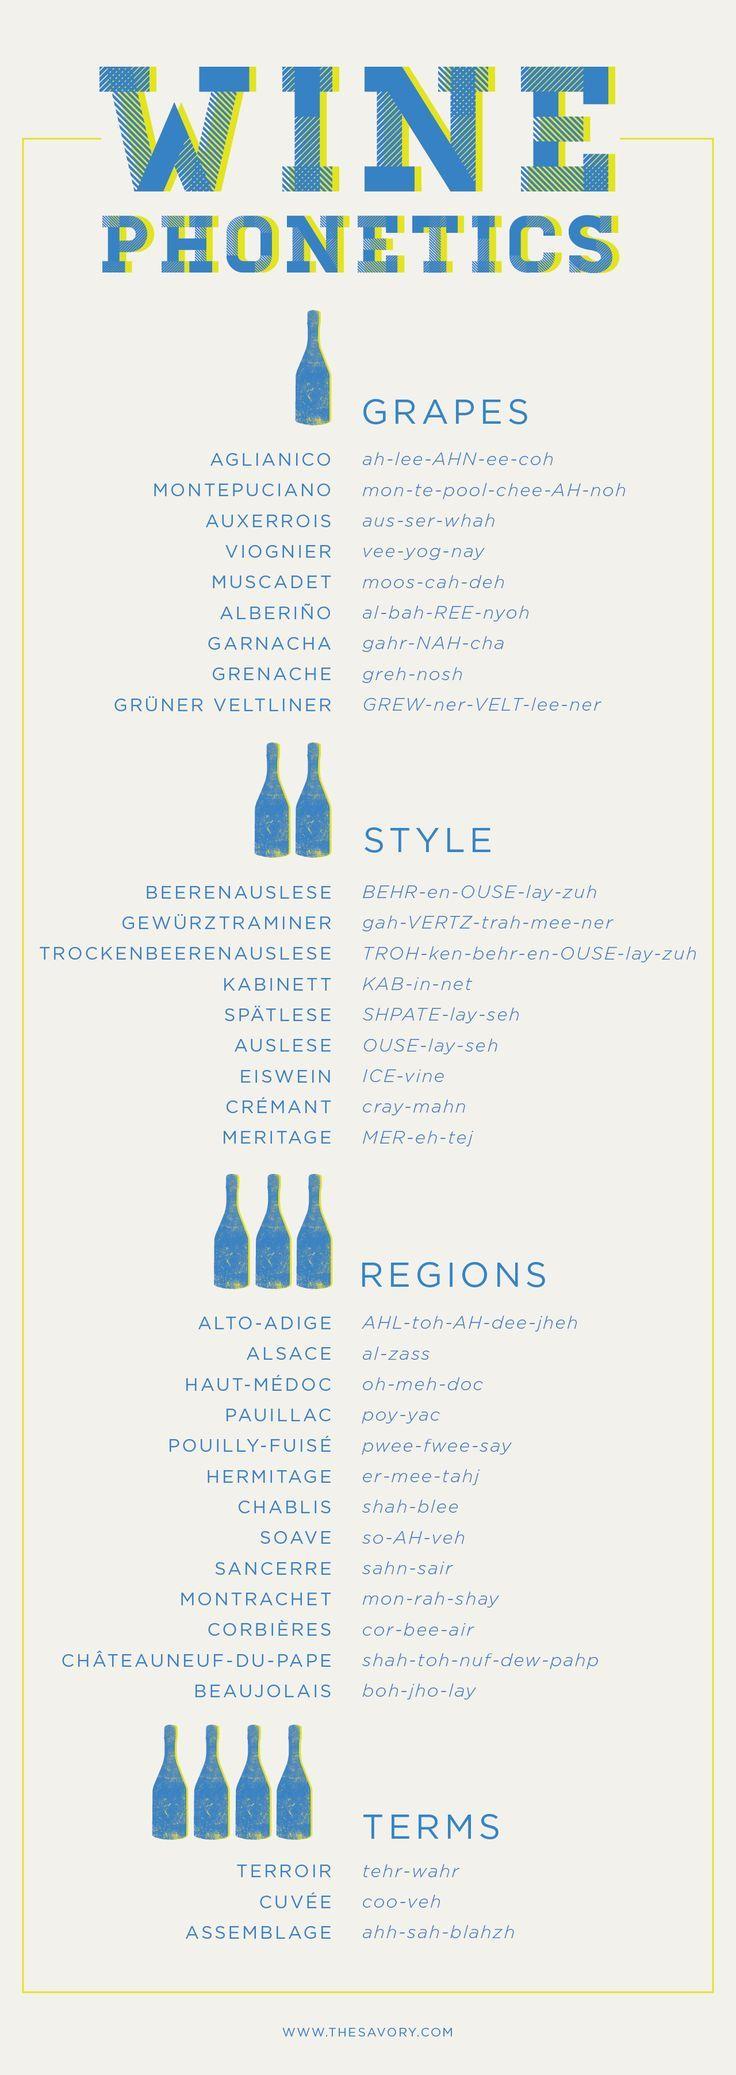 Wine Phonetics Infographic: Say It Don't Spray It